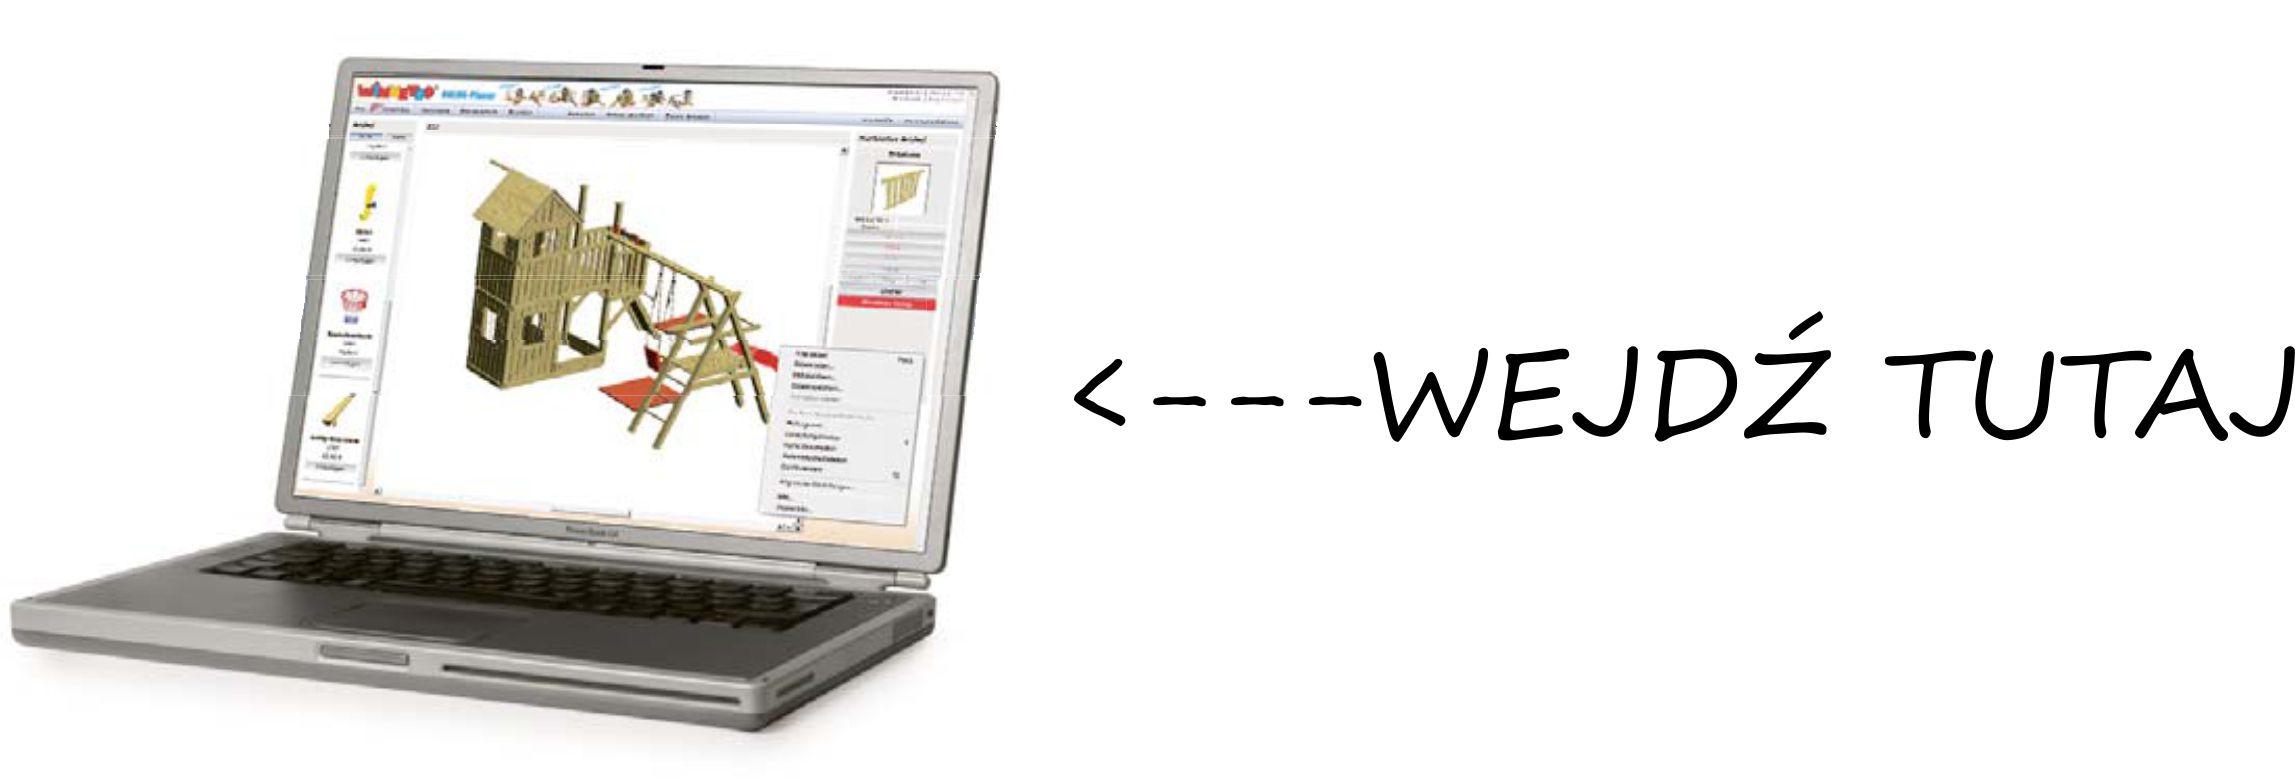 komputer_online_planner